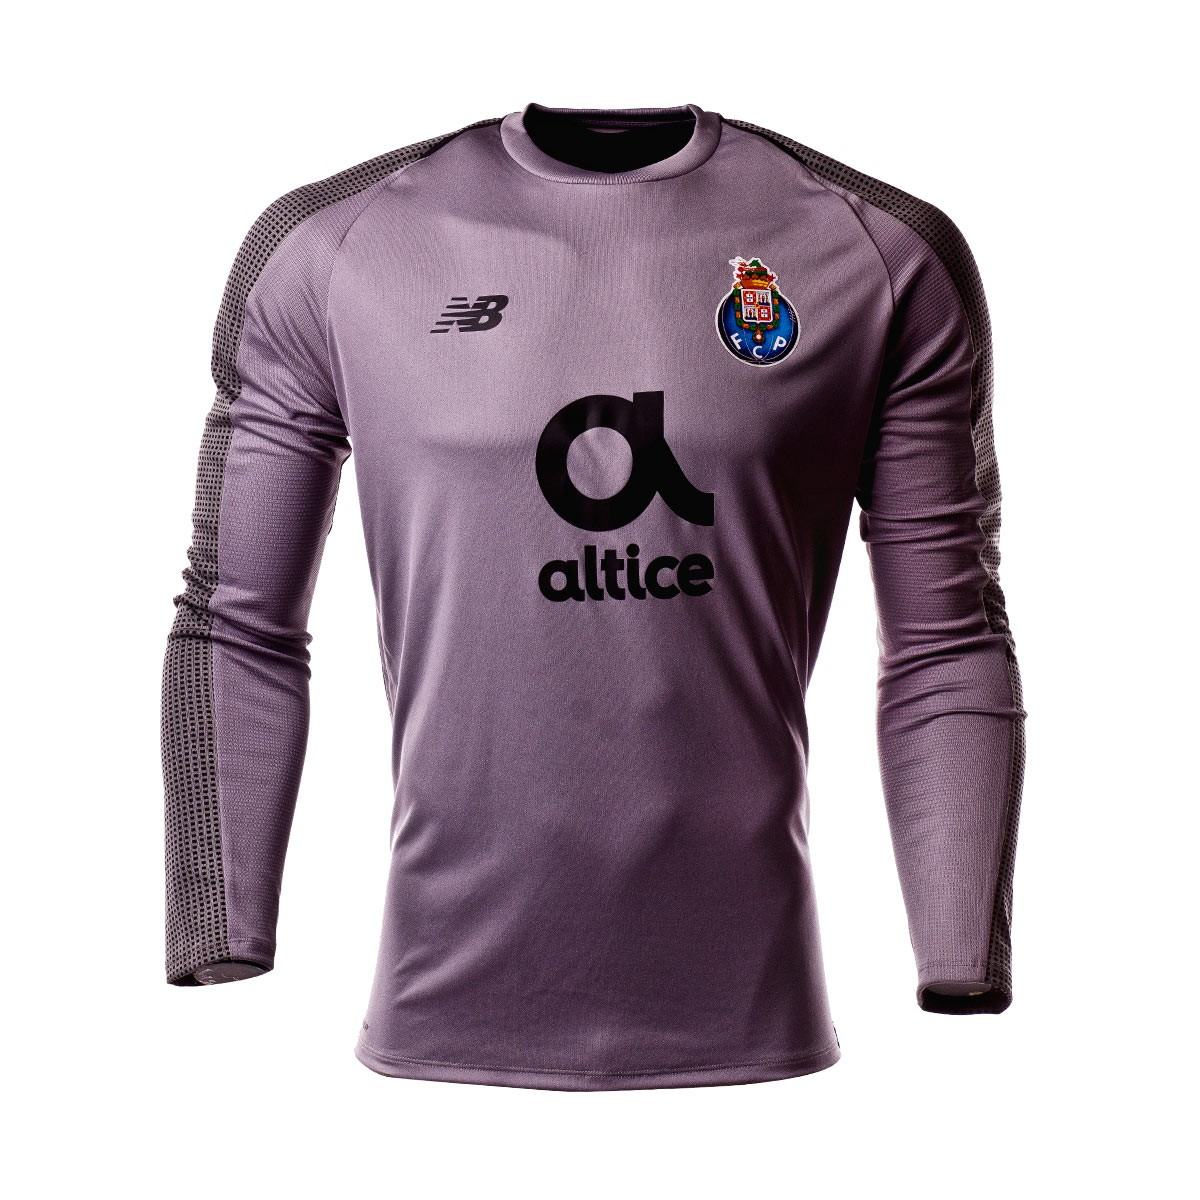 9016a93da Jersey New Balance Goalkeeper FC Porto 2018-2019 Home Gris - Football store  Fútbol Emotion